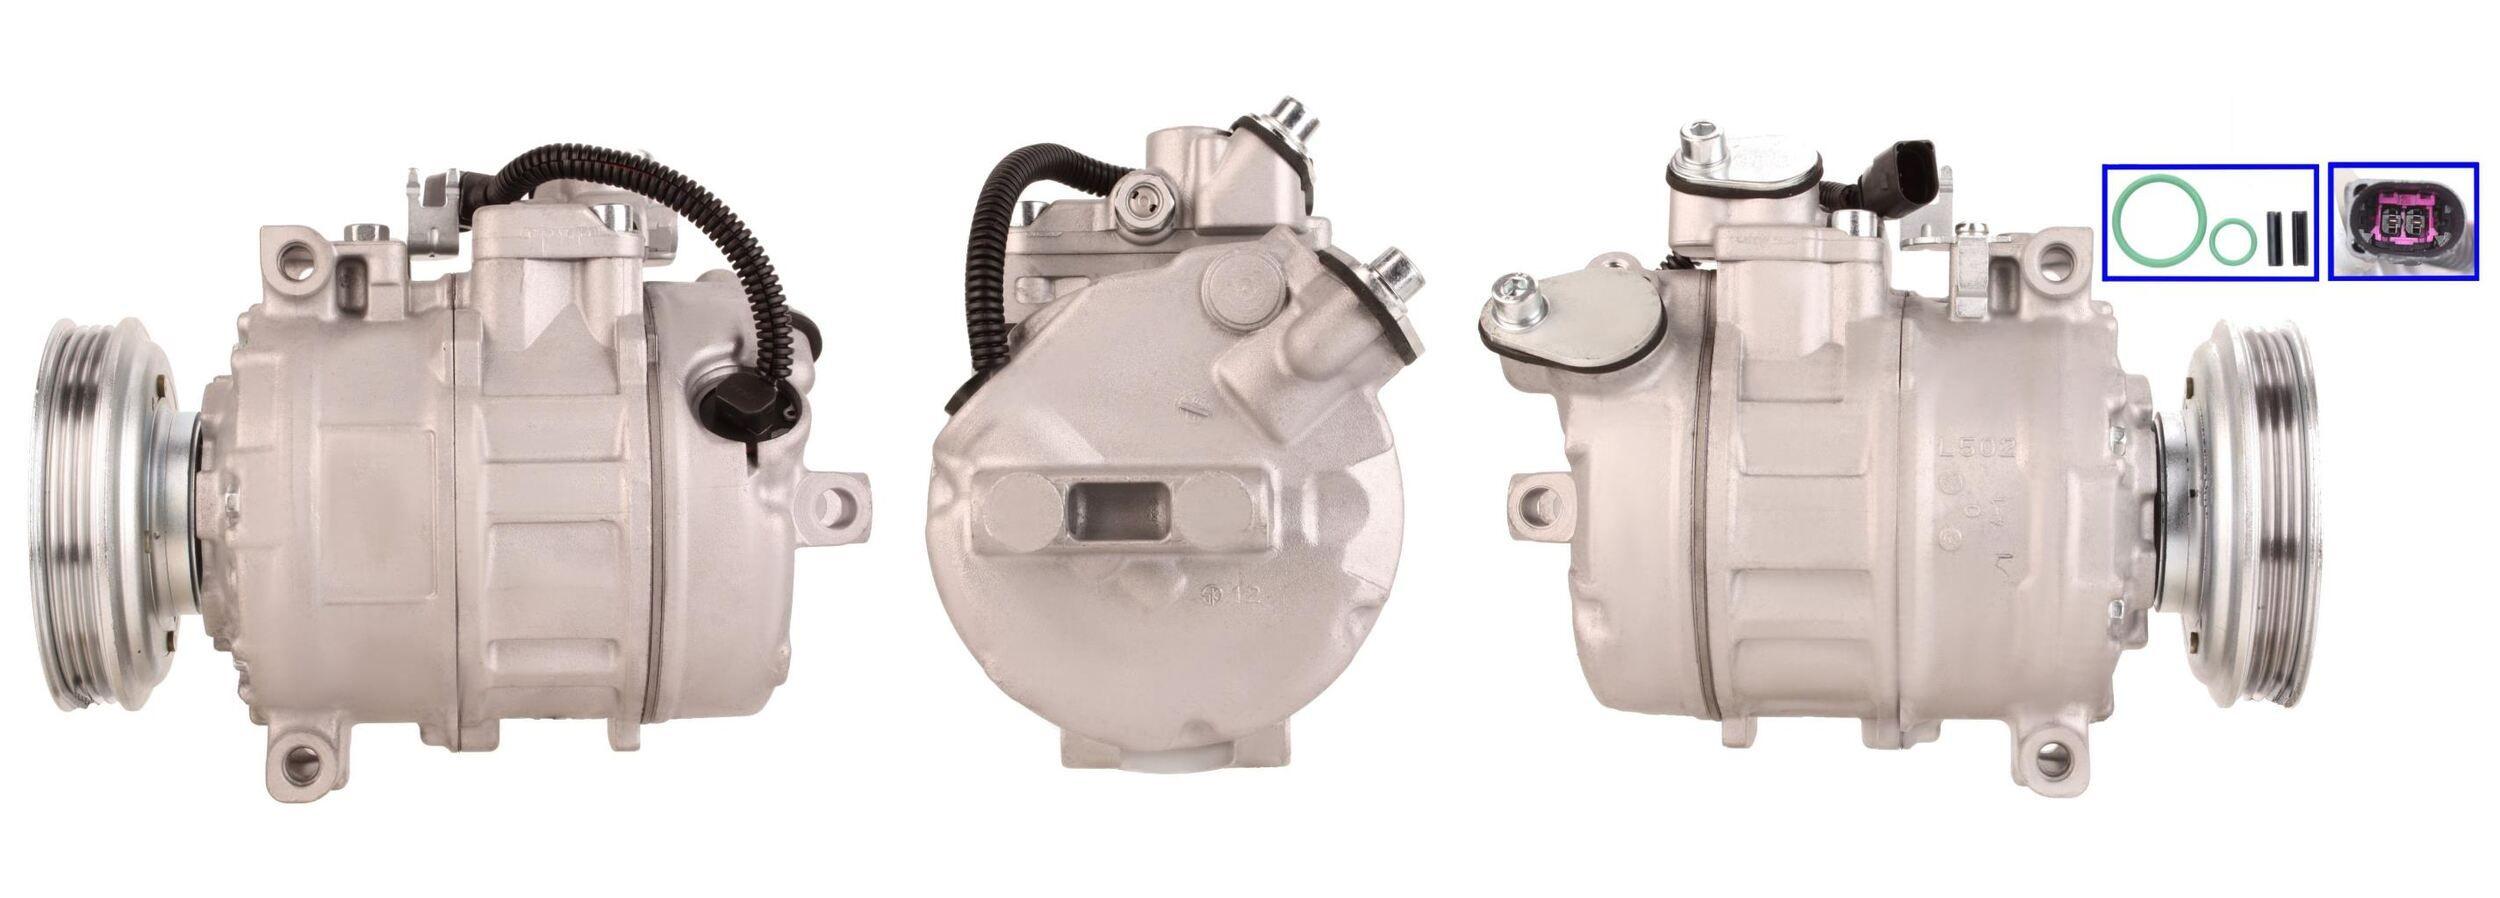 Original AUDI Kompressor Klimaanlage 51-0140